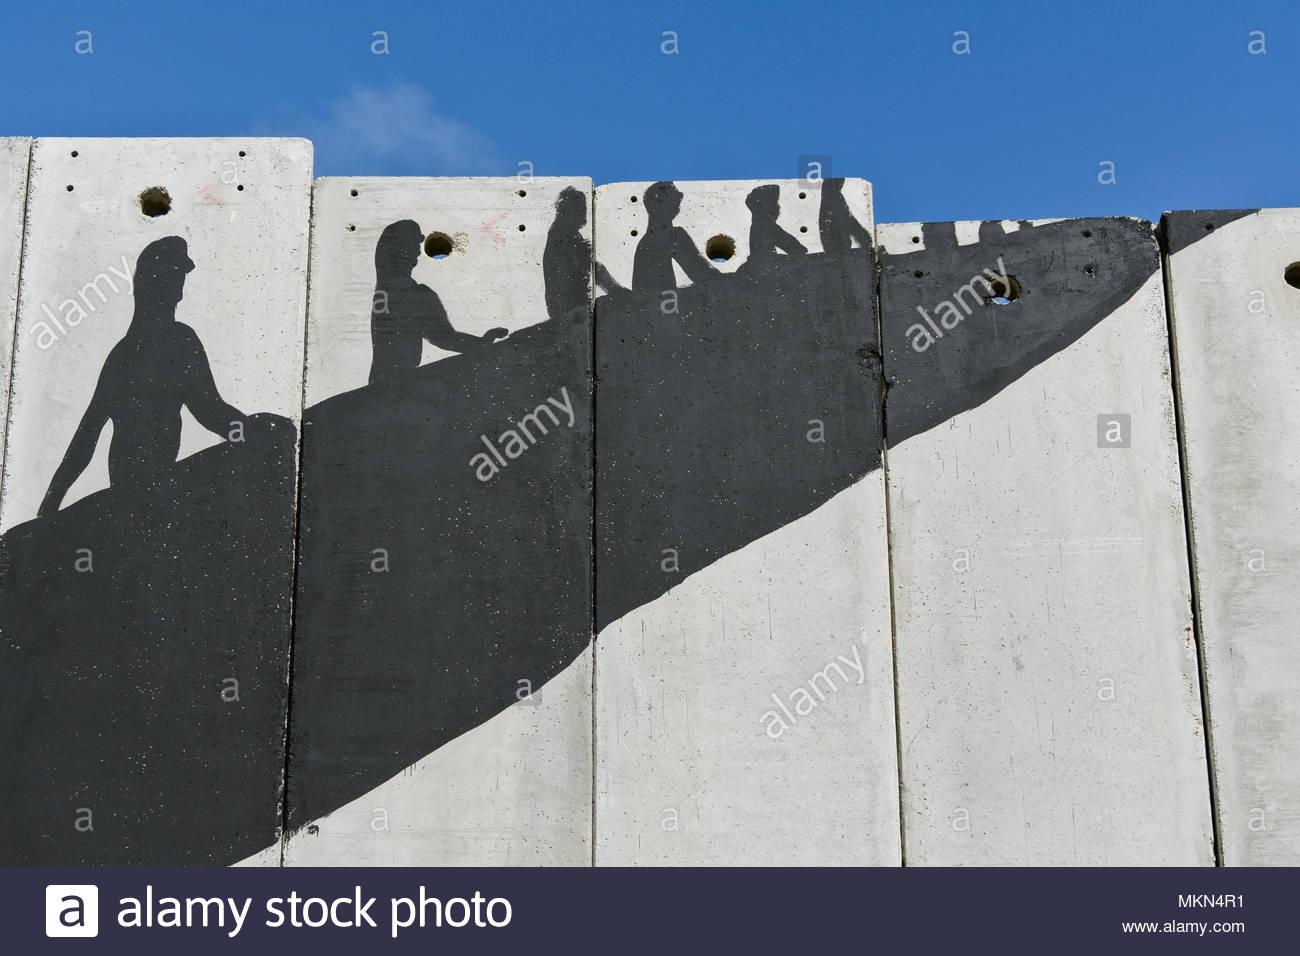 A banksy graffiti on the separation wall,Bethlehem, Palestine - Stock Image